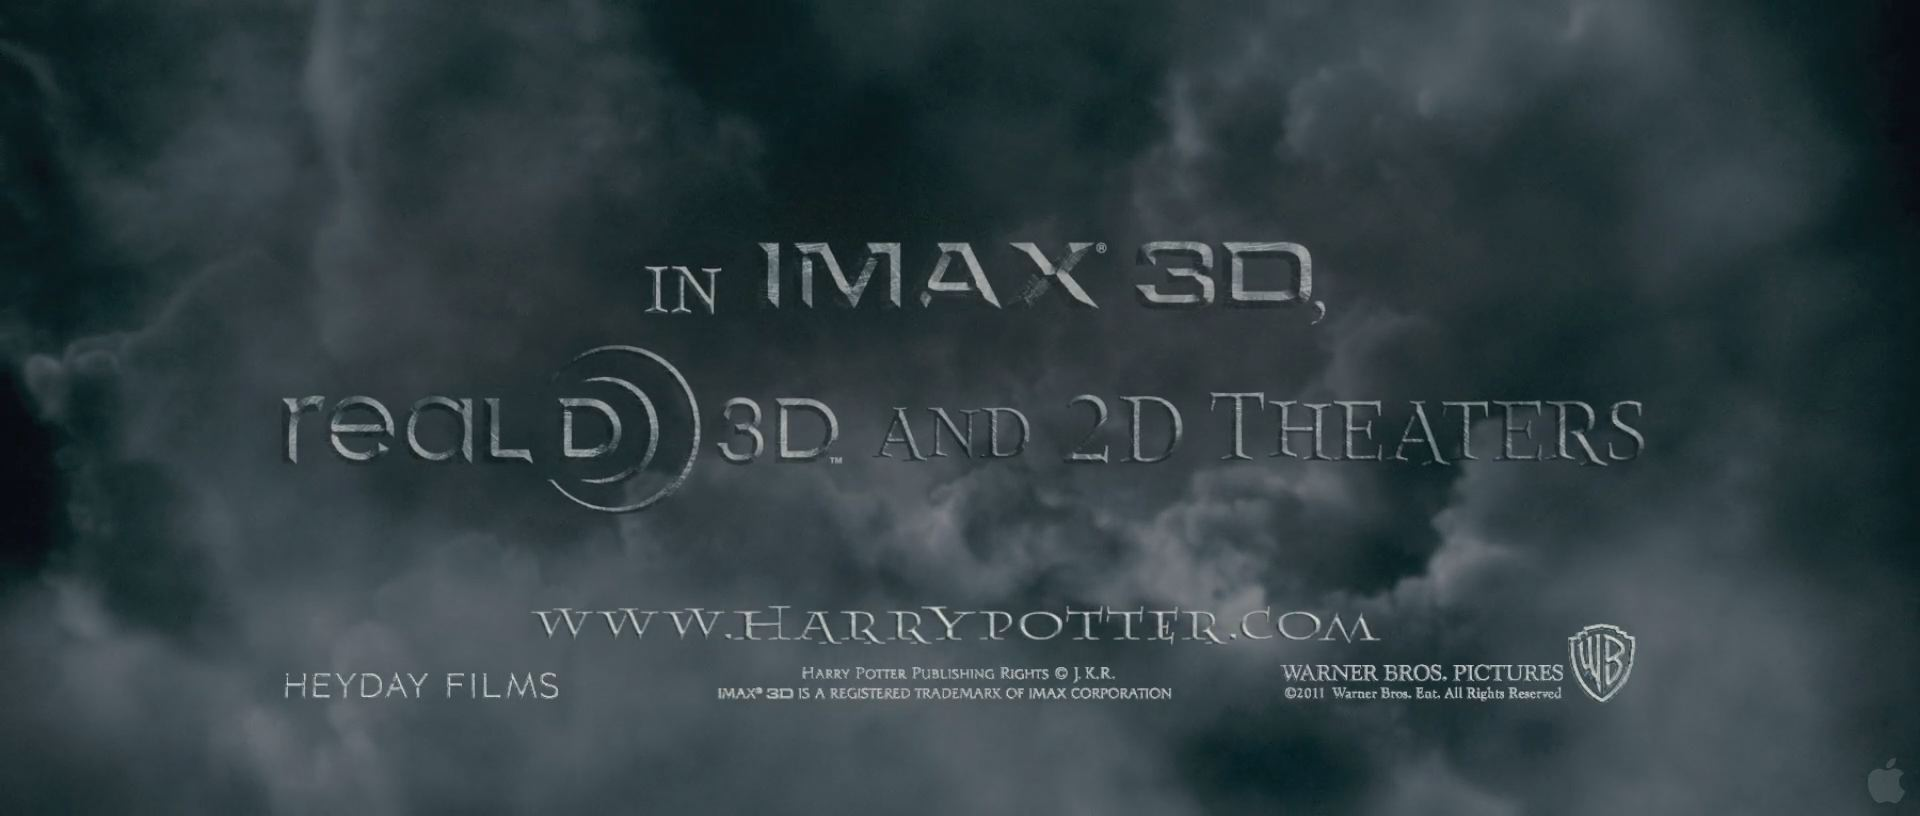 Harry Potter BlogHogwarts HP7 2 Trailer 95